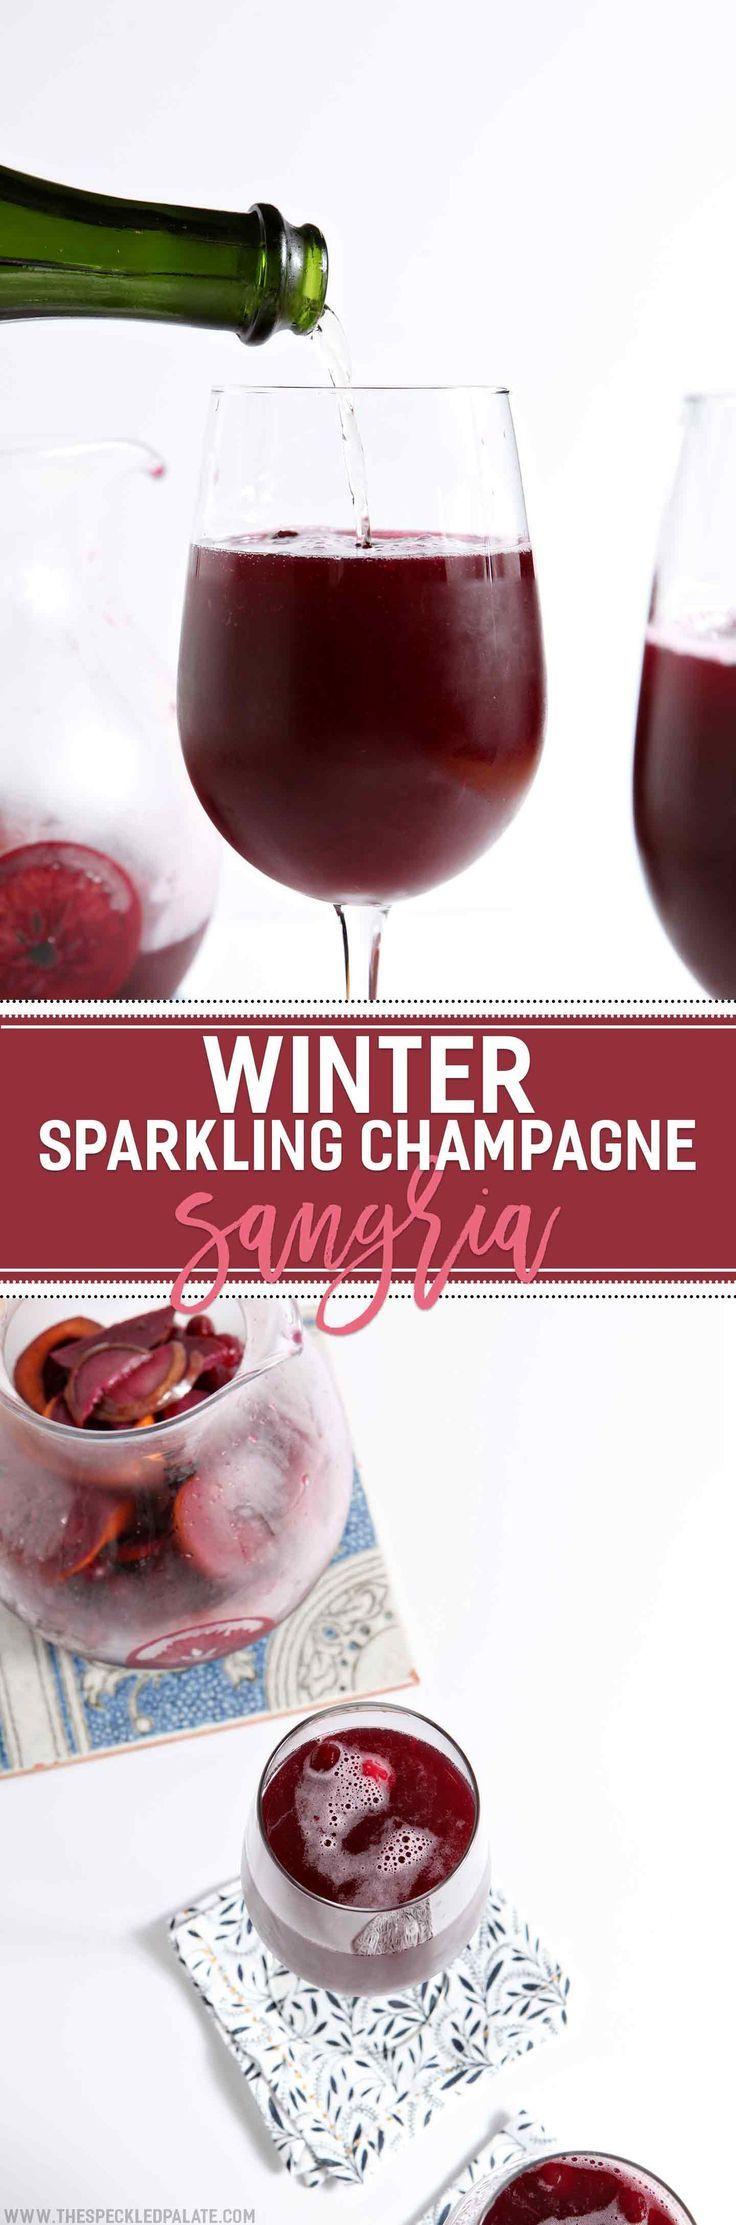 Winter Sparkling Champagne Sangria Recipe Champagne Sangria Food Sangria